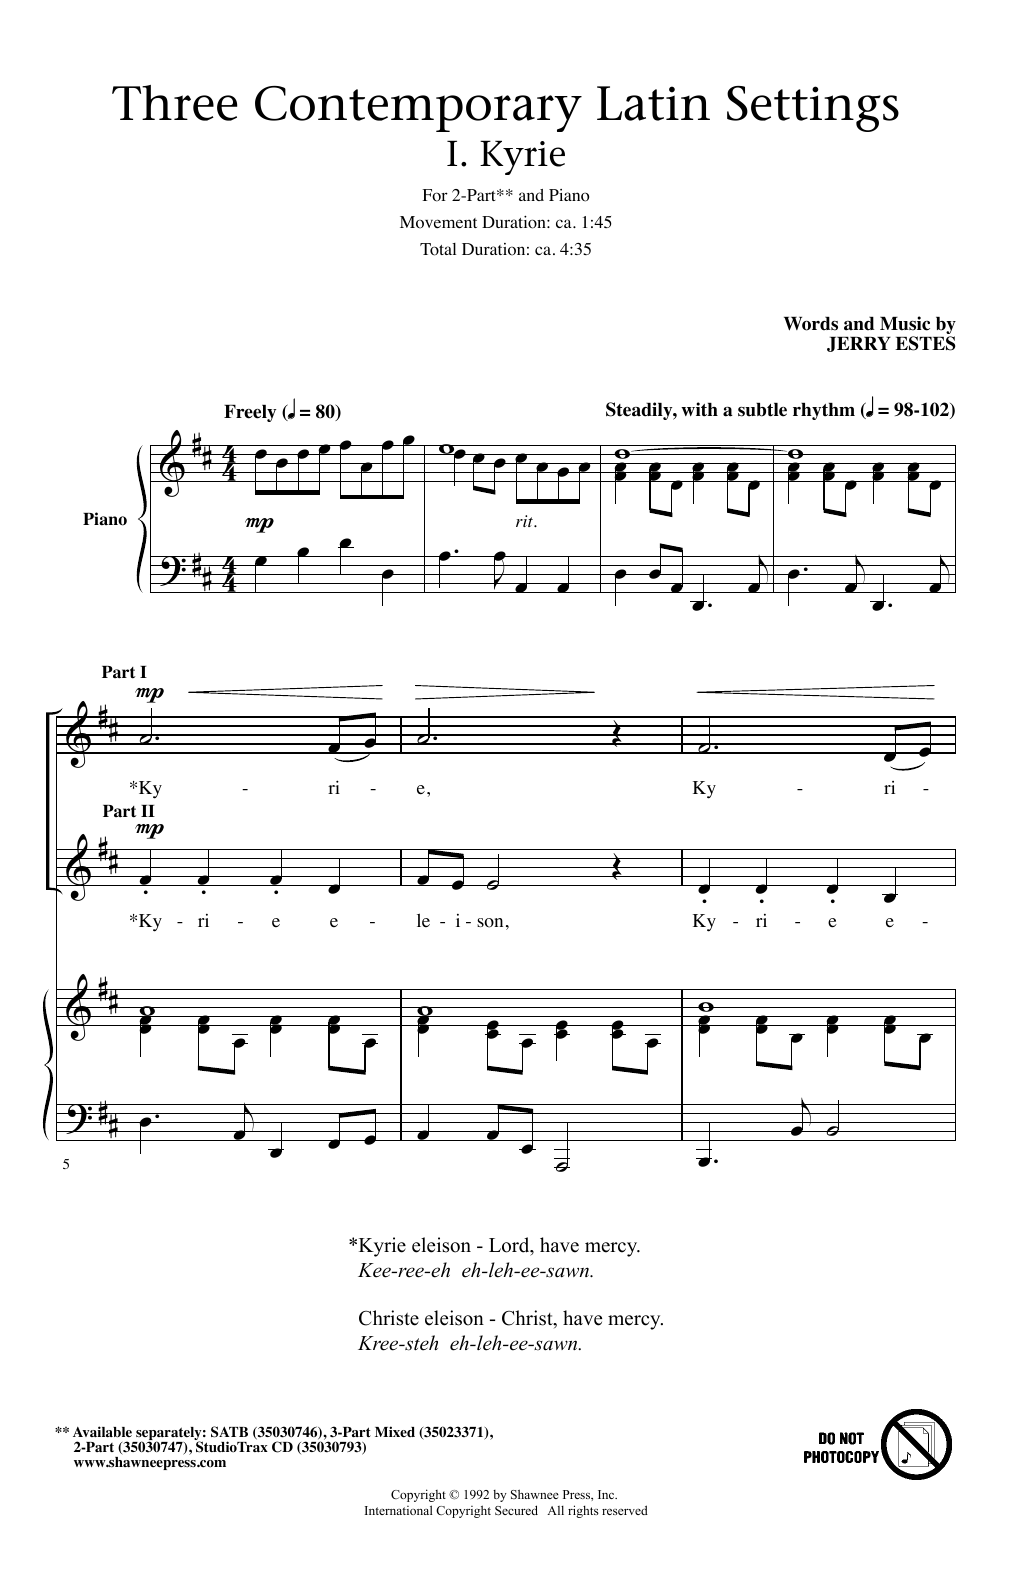 Sheet Music Digital Files To Print - Licensed Choral Digital Sheet Music